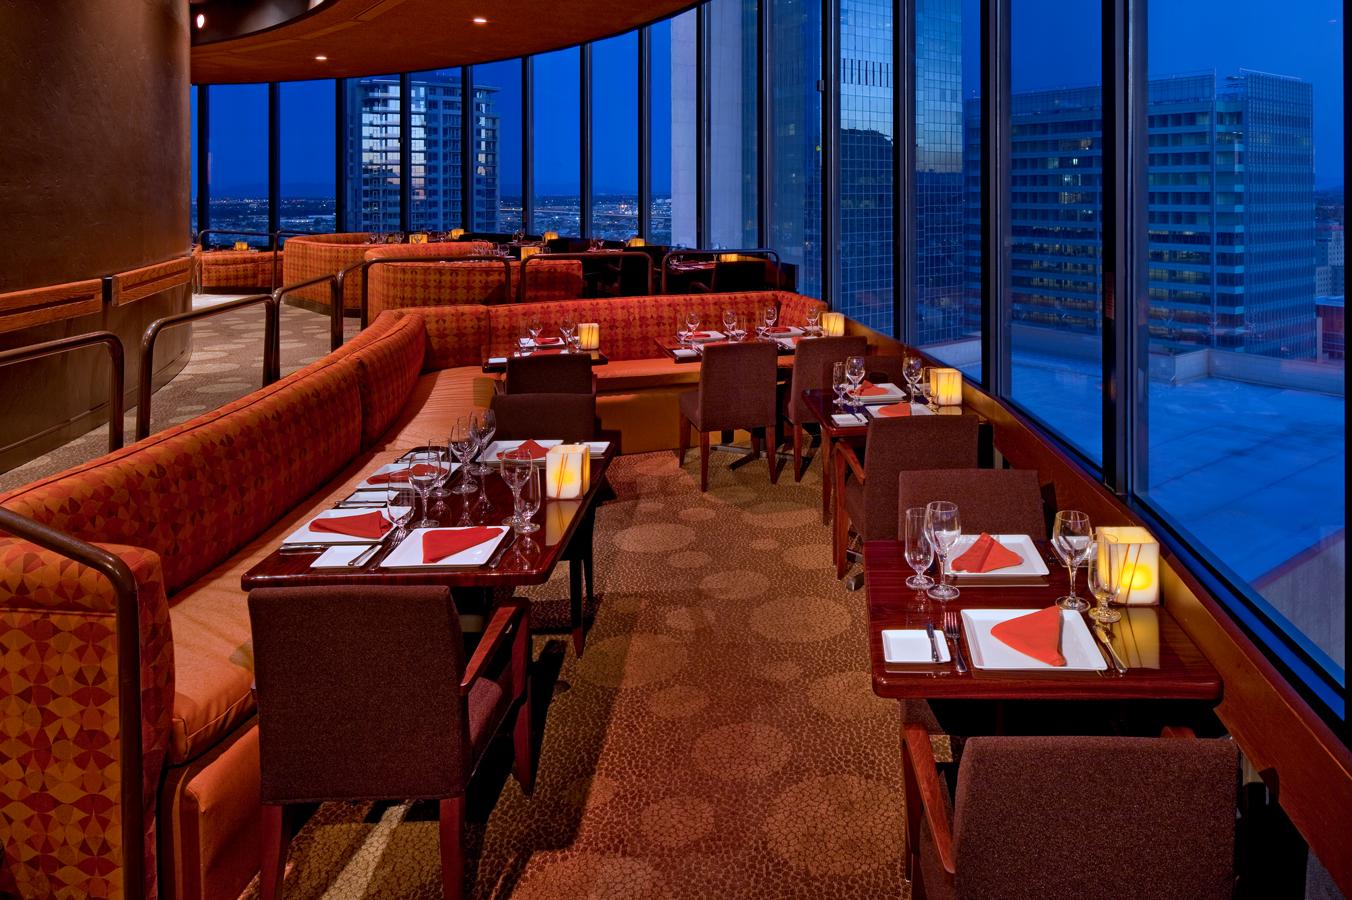 Compass Arizona Grill At Hyatt Regency Phoenix Hotel Is